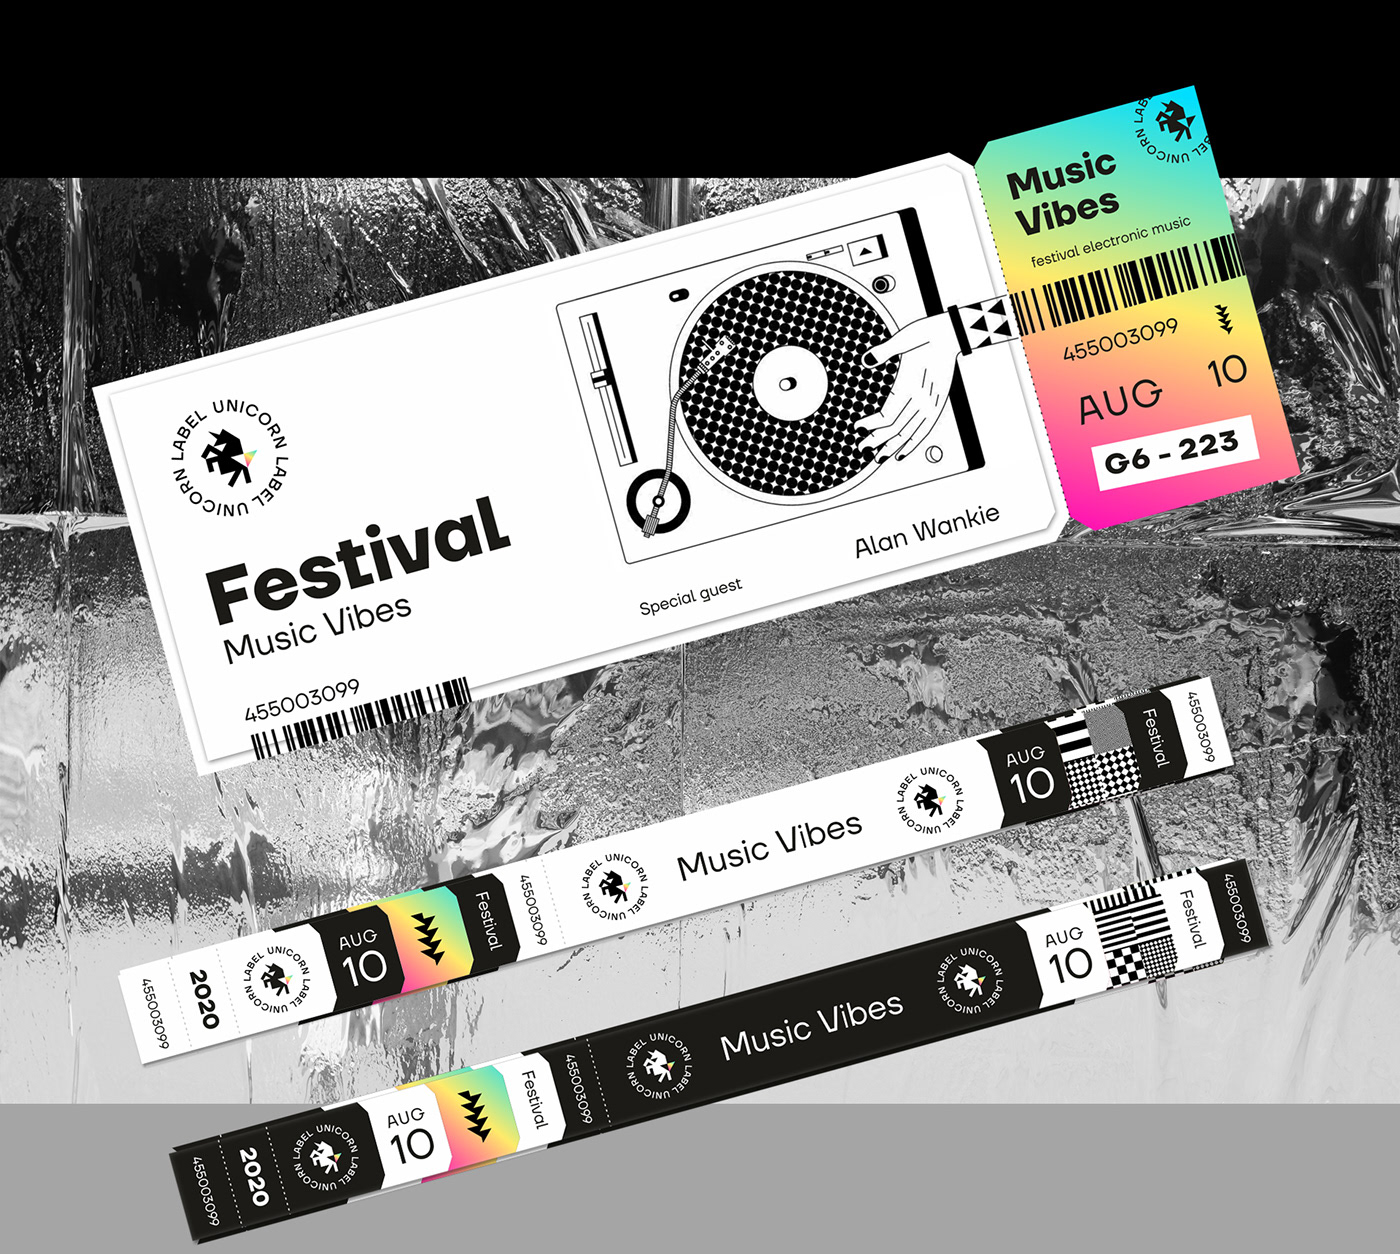 logo music unicorn metalic holograph rainbow Electonic dj festival Label